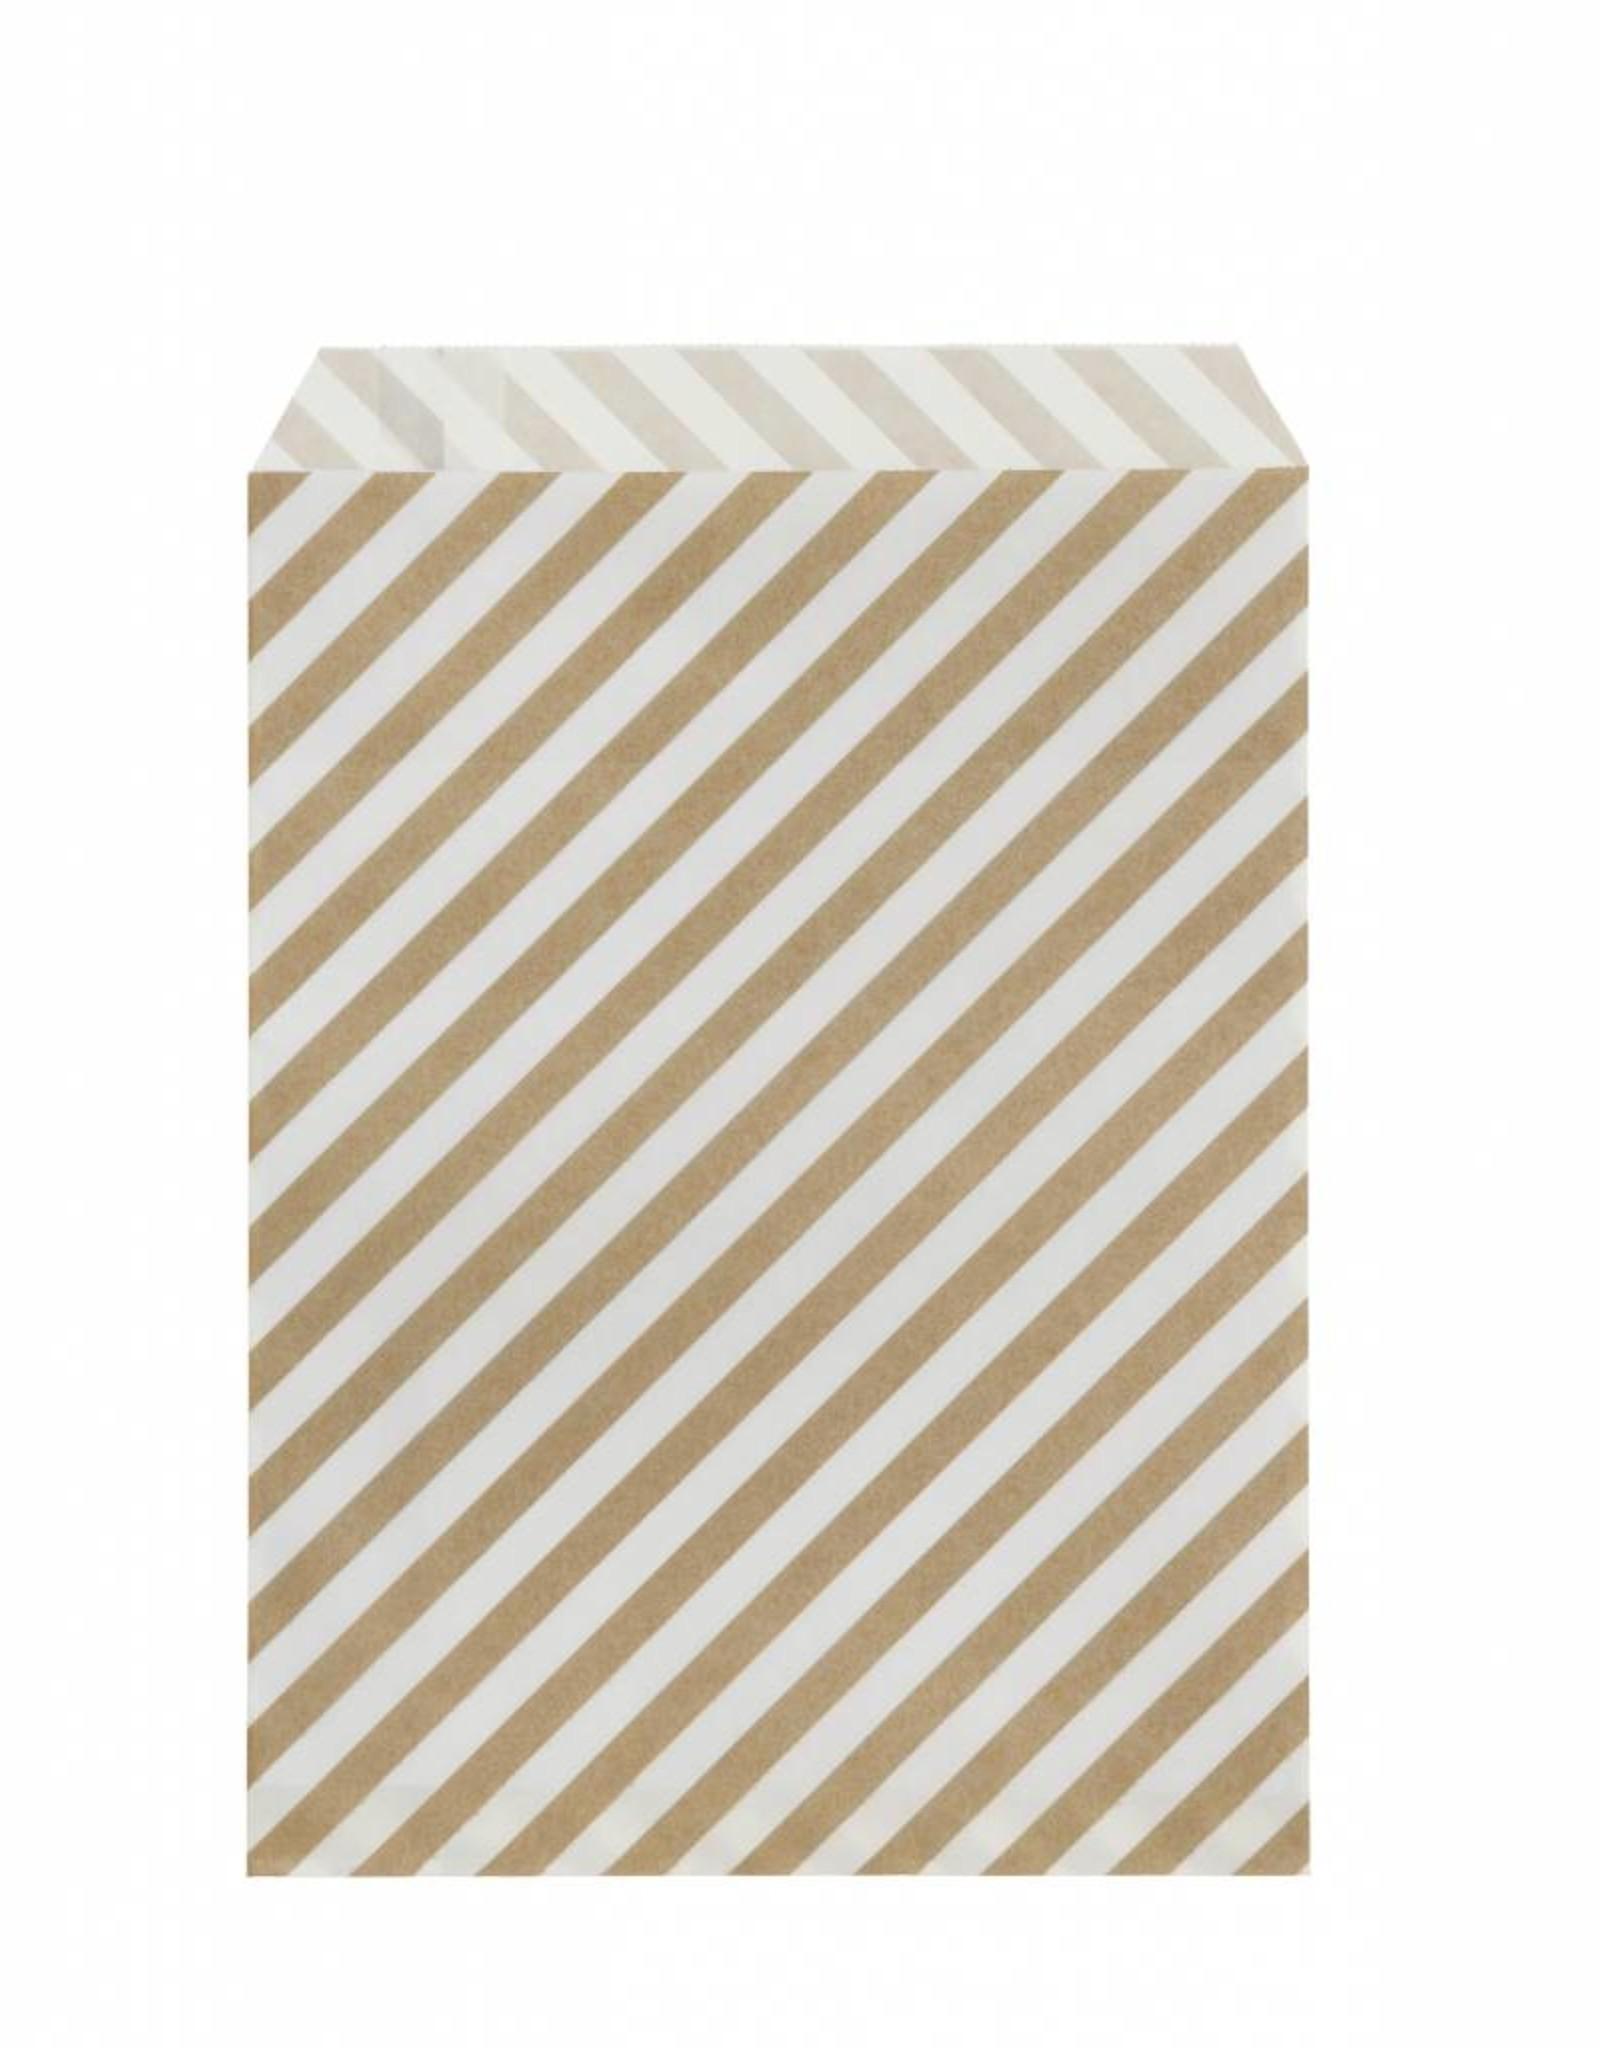 Ferm Living Sac Papier rayures en or